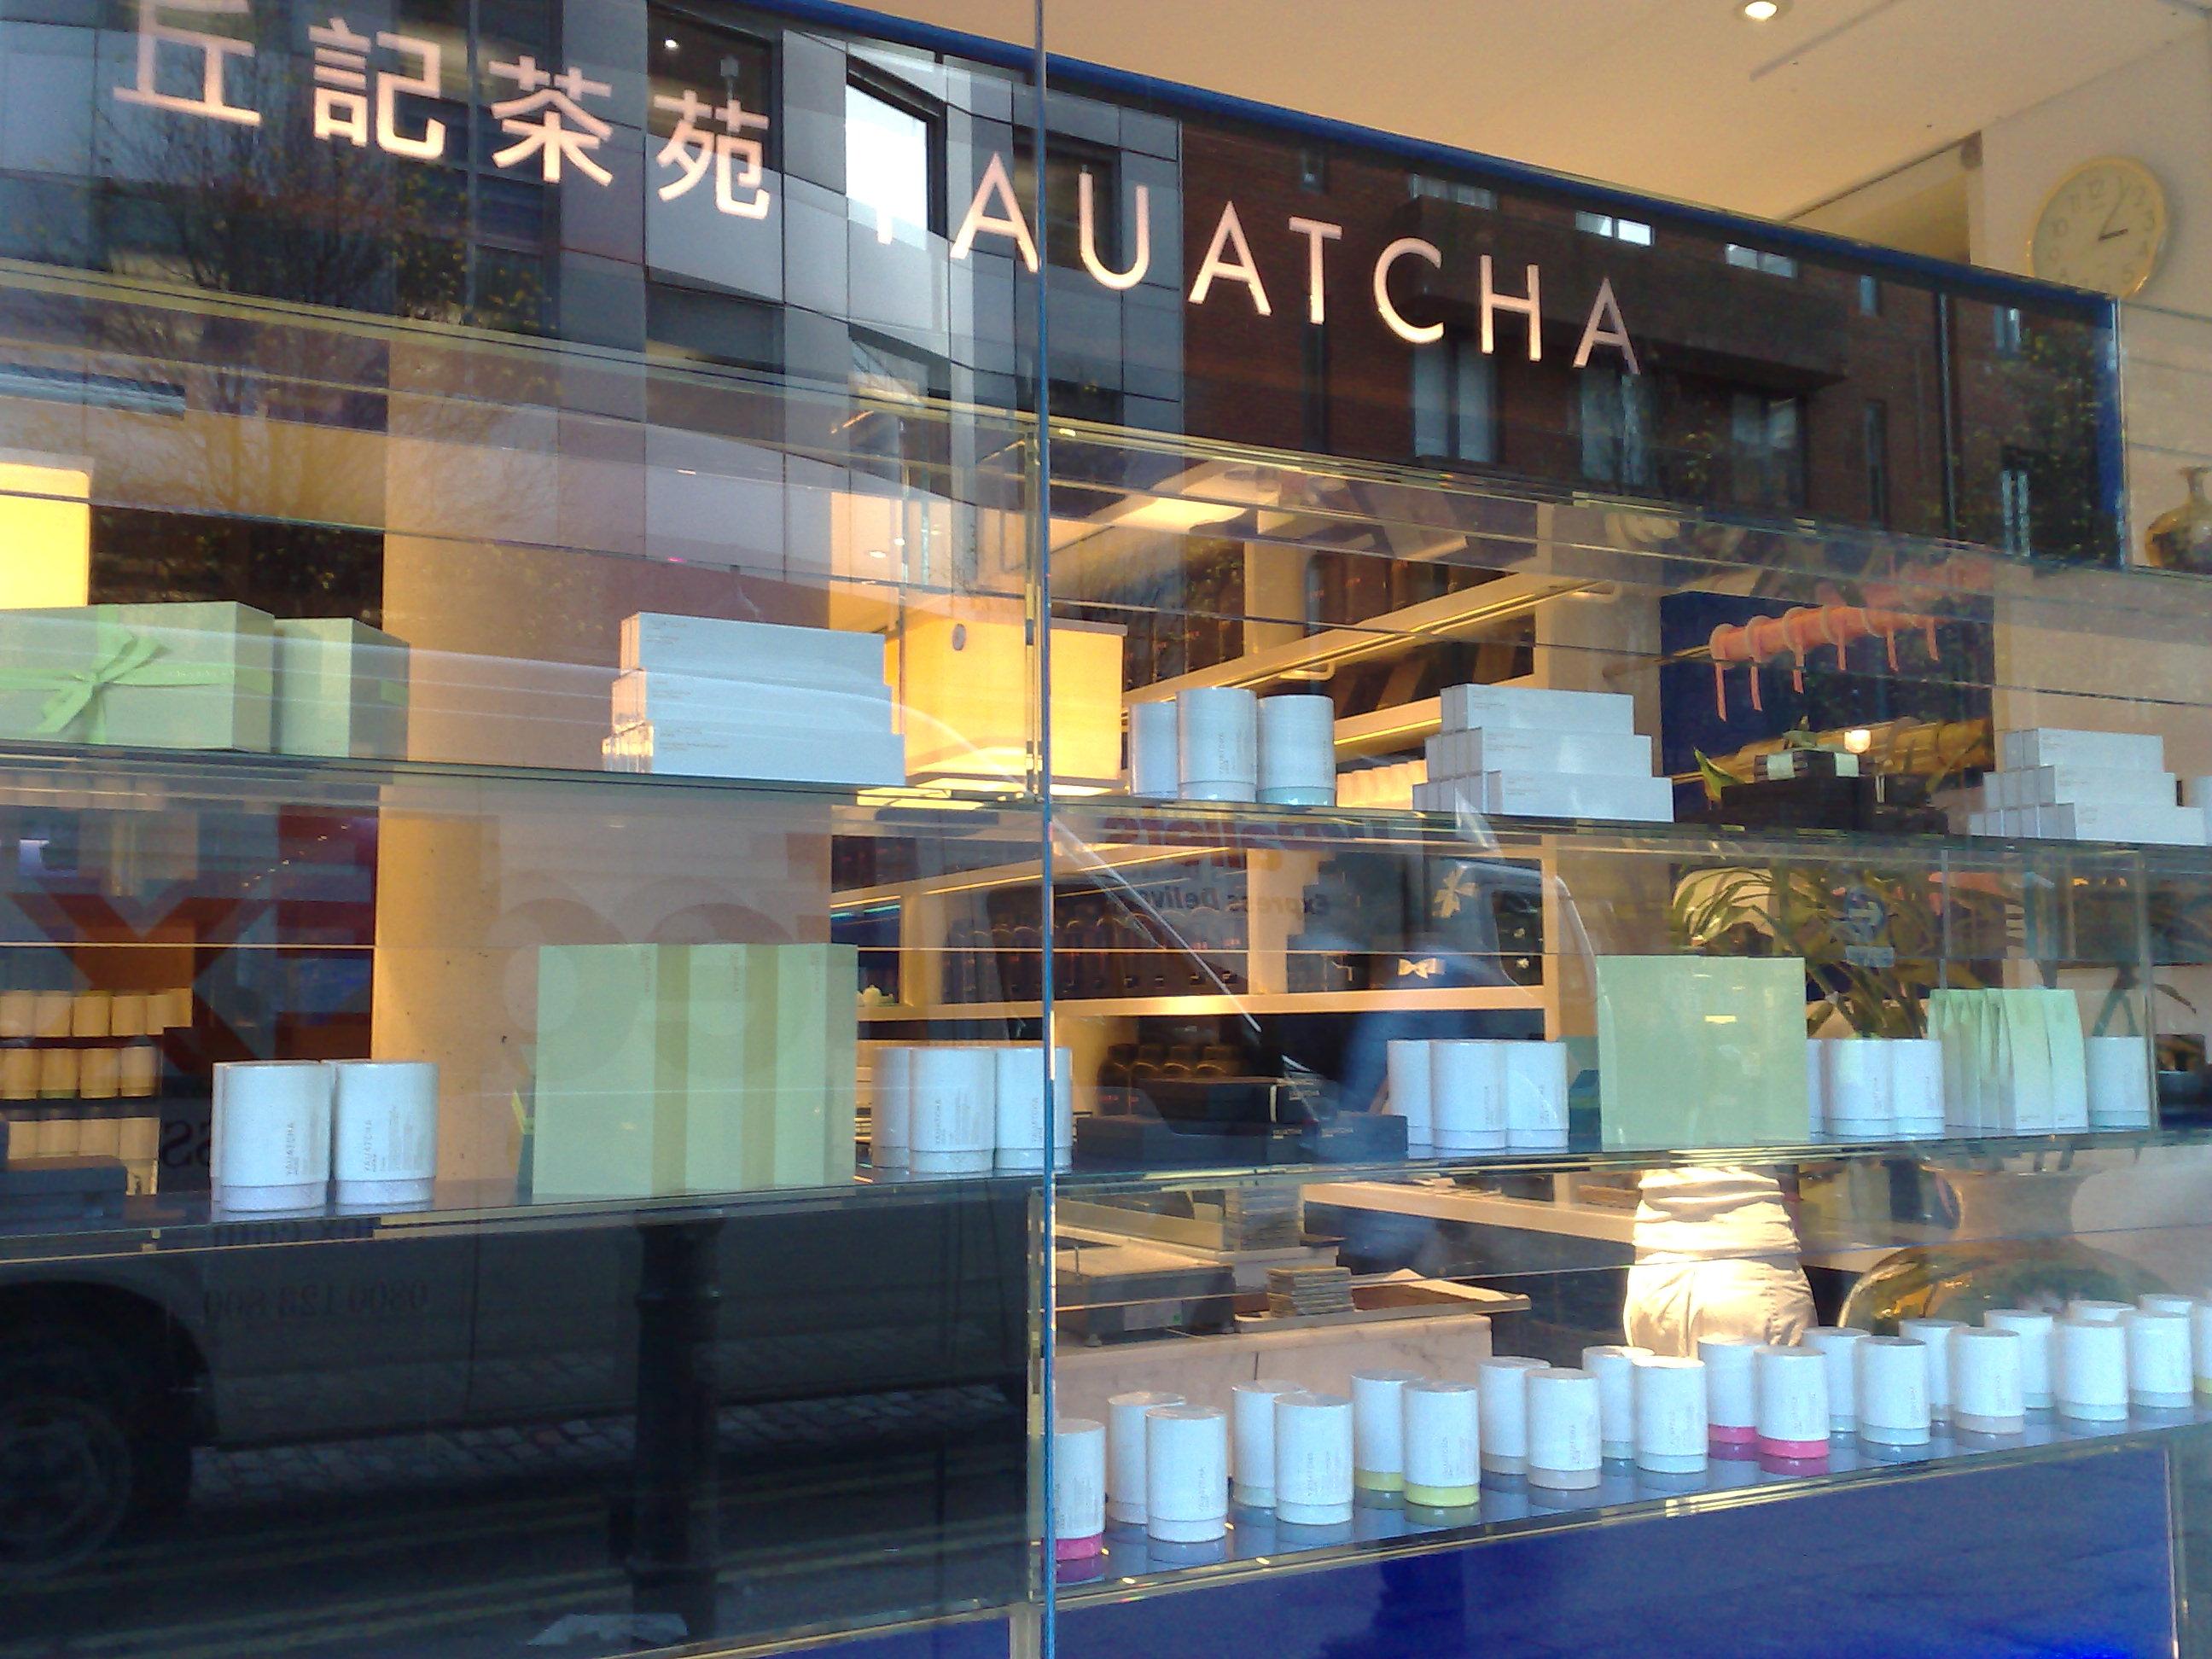 Yauatcha front